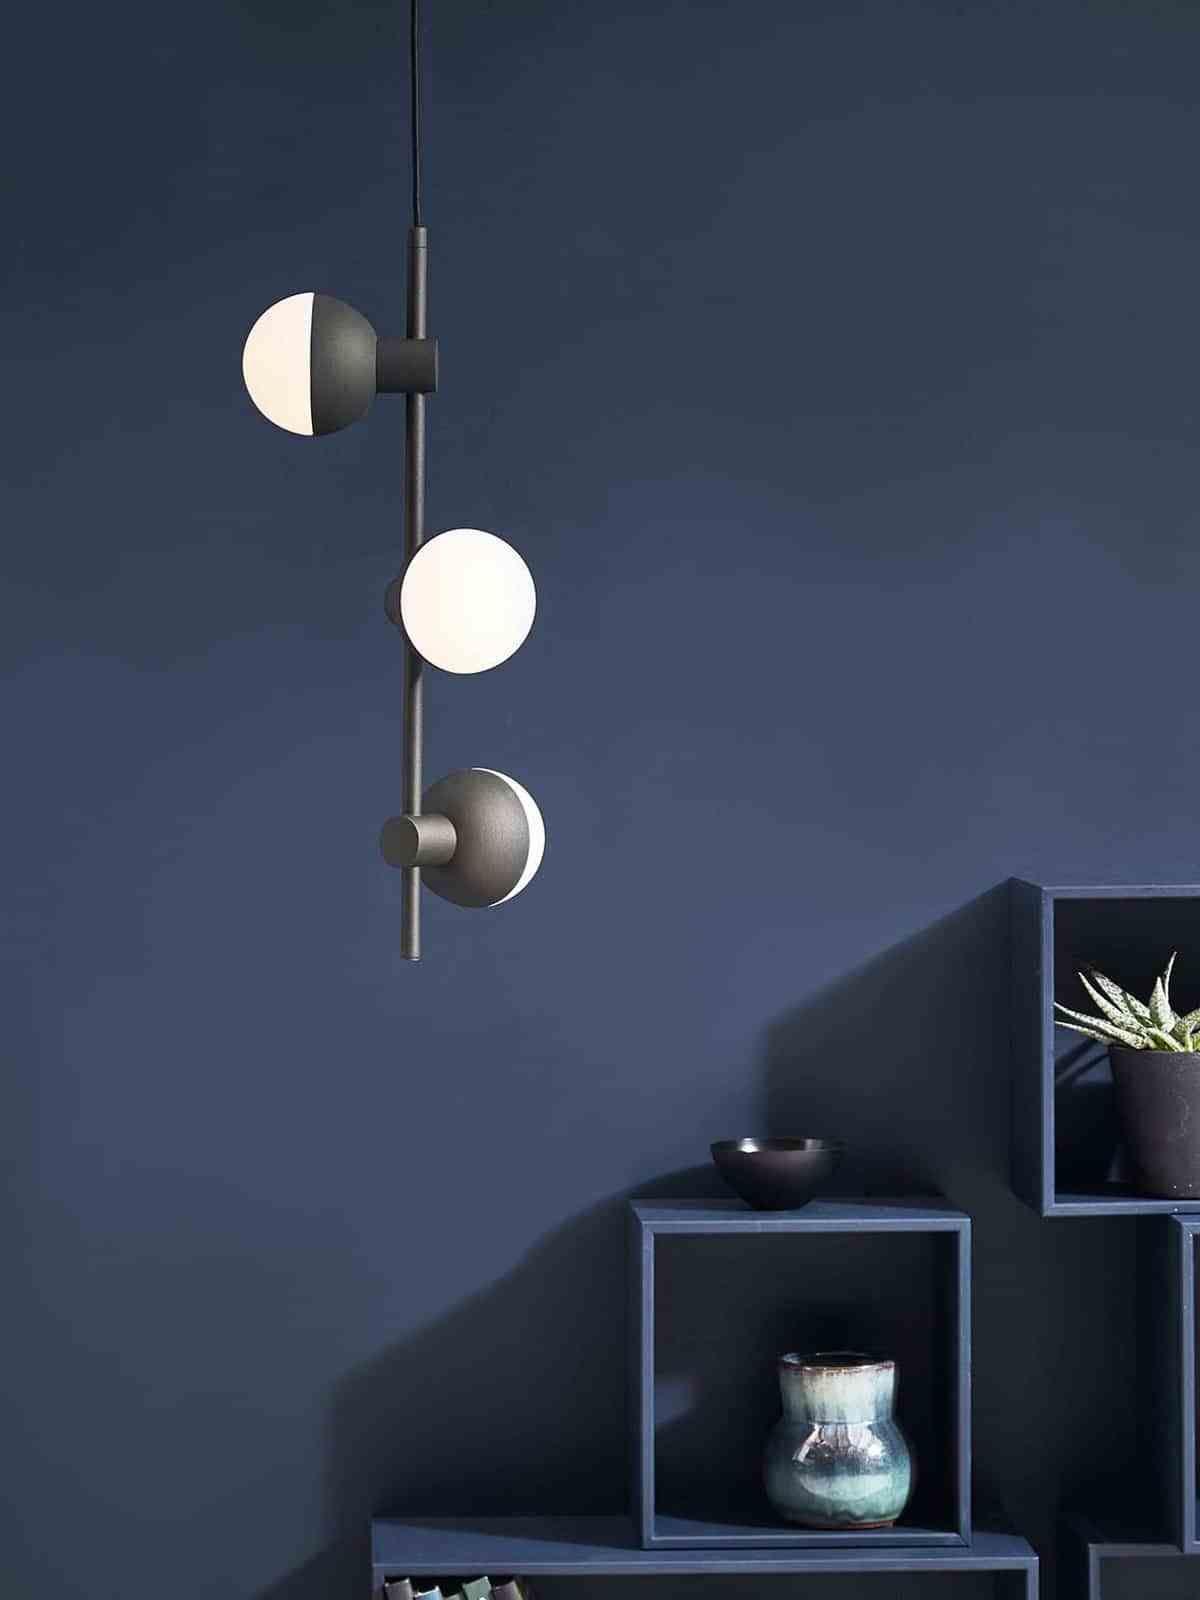 Atemberaubend Pleasurable Design Ideas Lampen Berlin Galerie ...